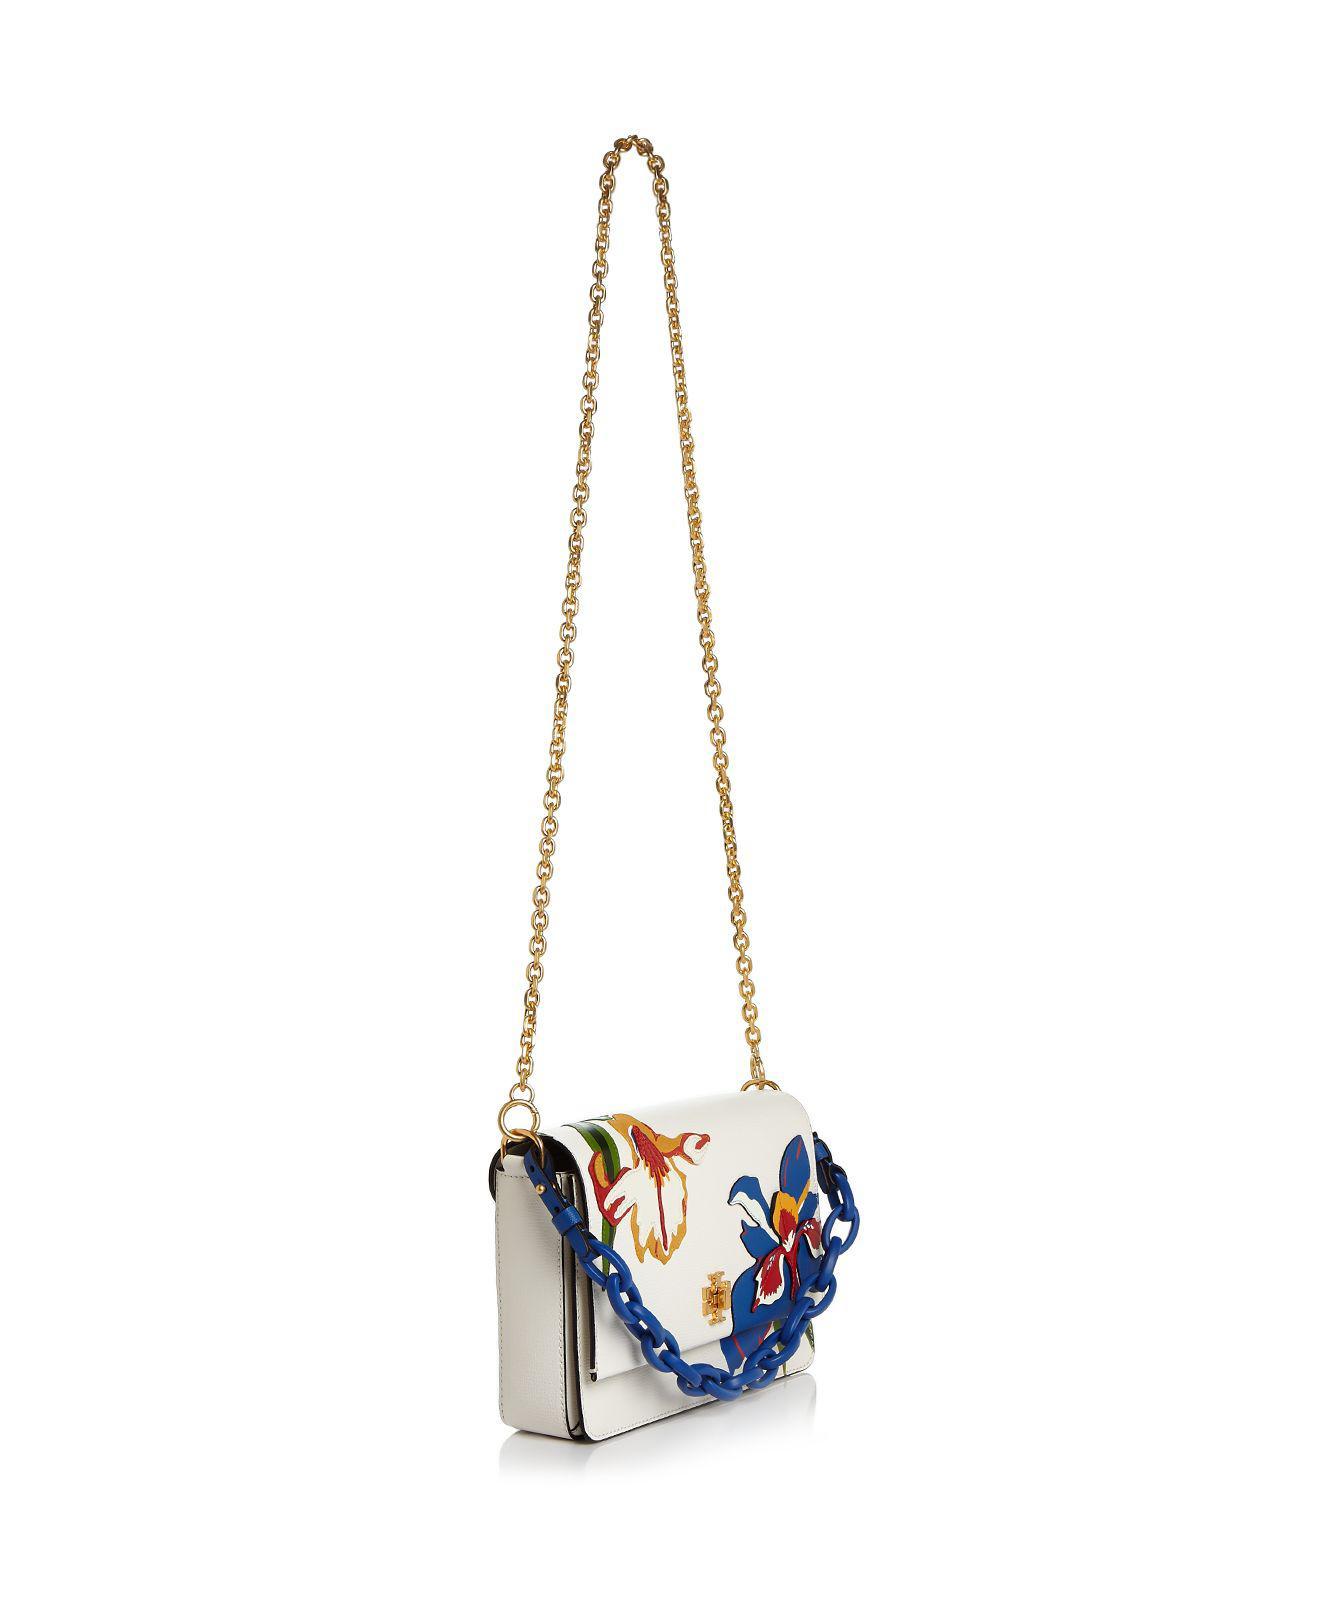 39663556bbe Lyst - Tory Burch Kira Applique Leather Shoulder Bag